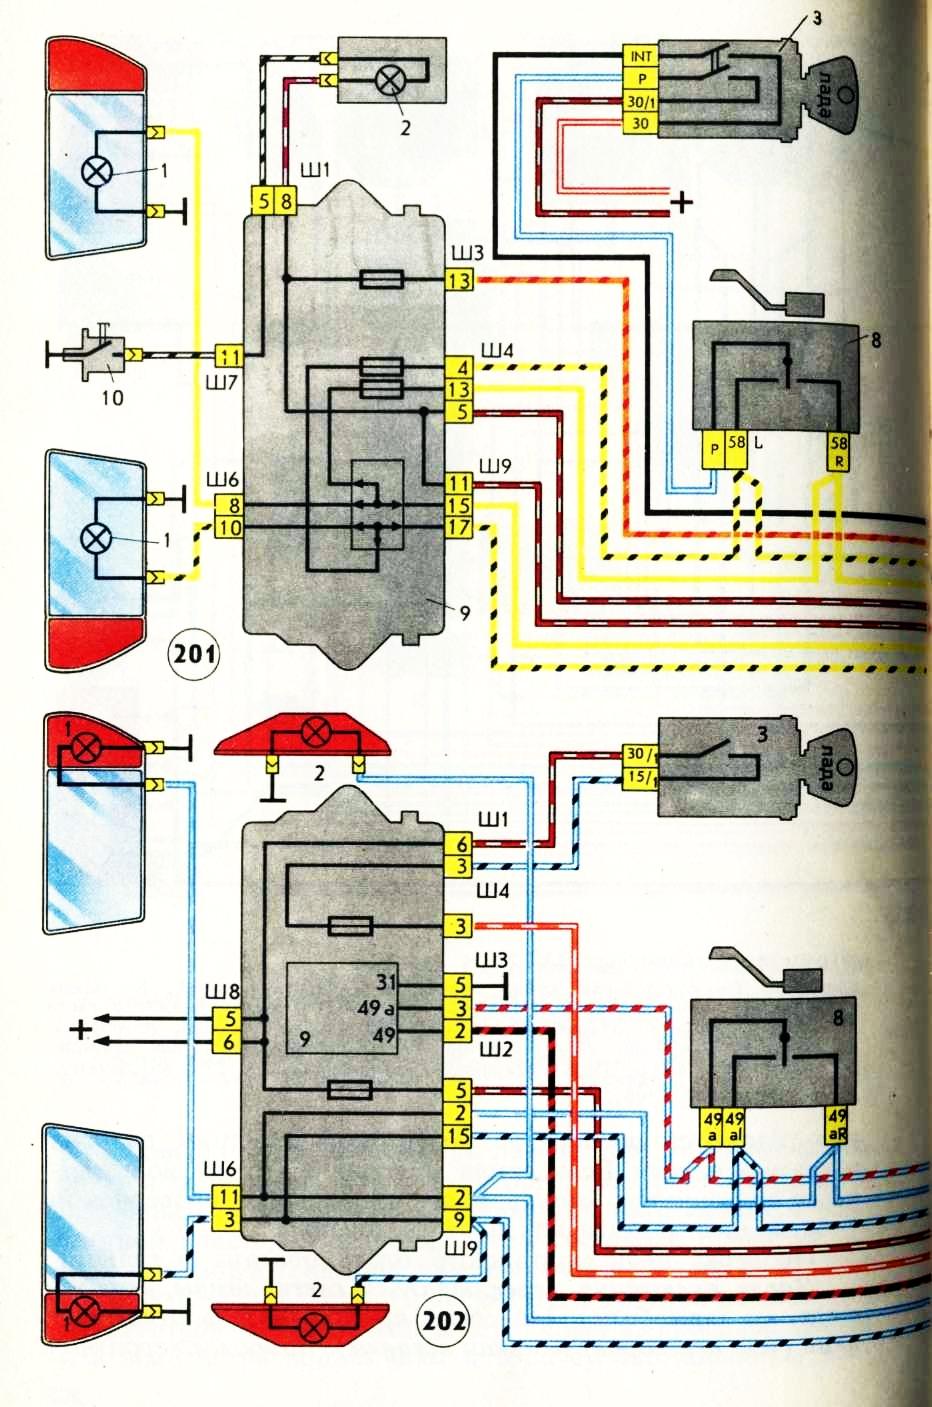 ваз2109 схема эппх